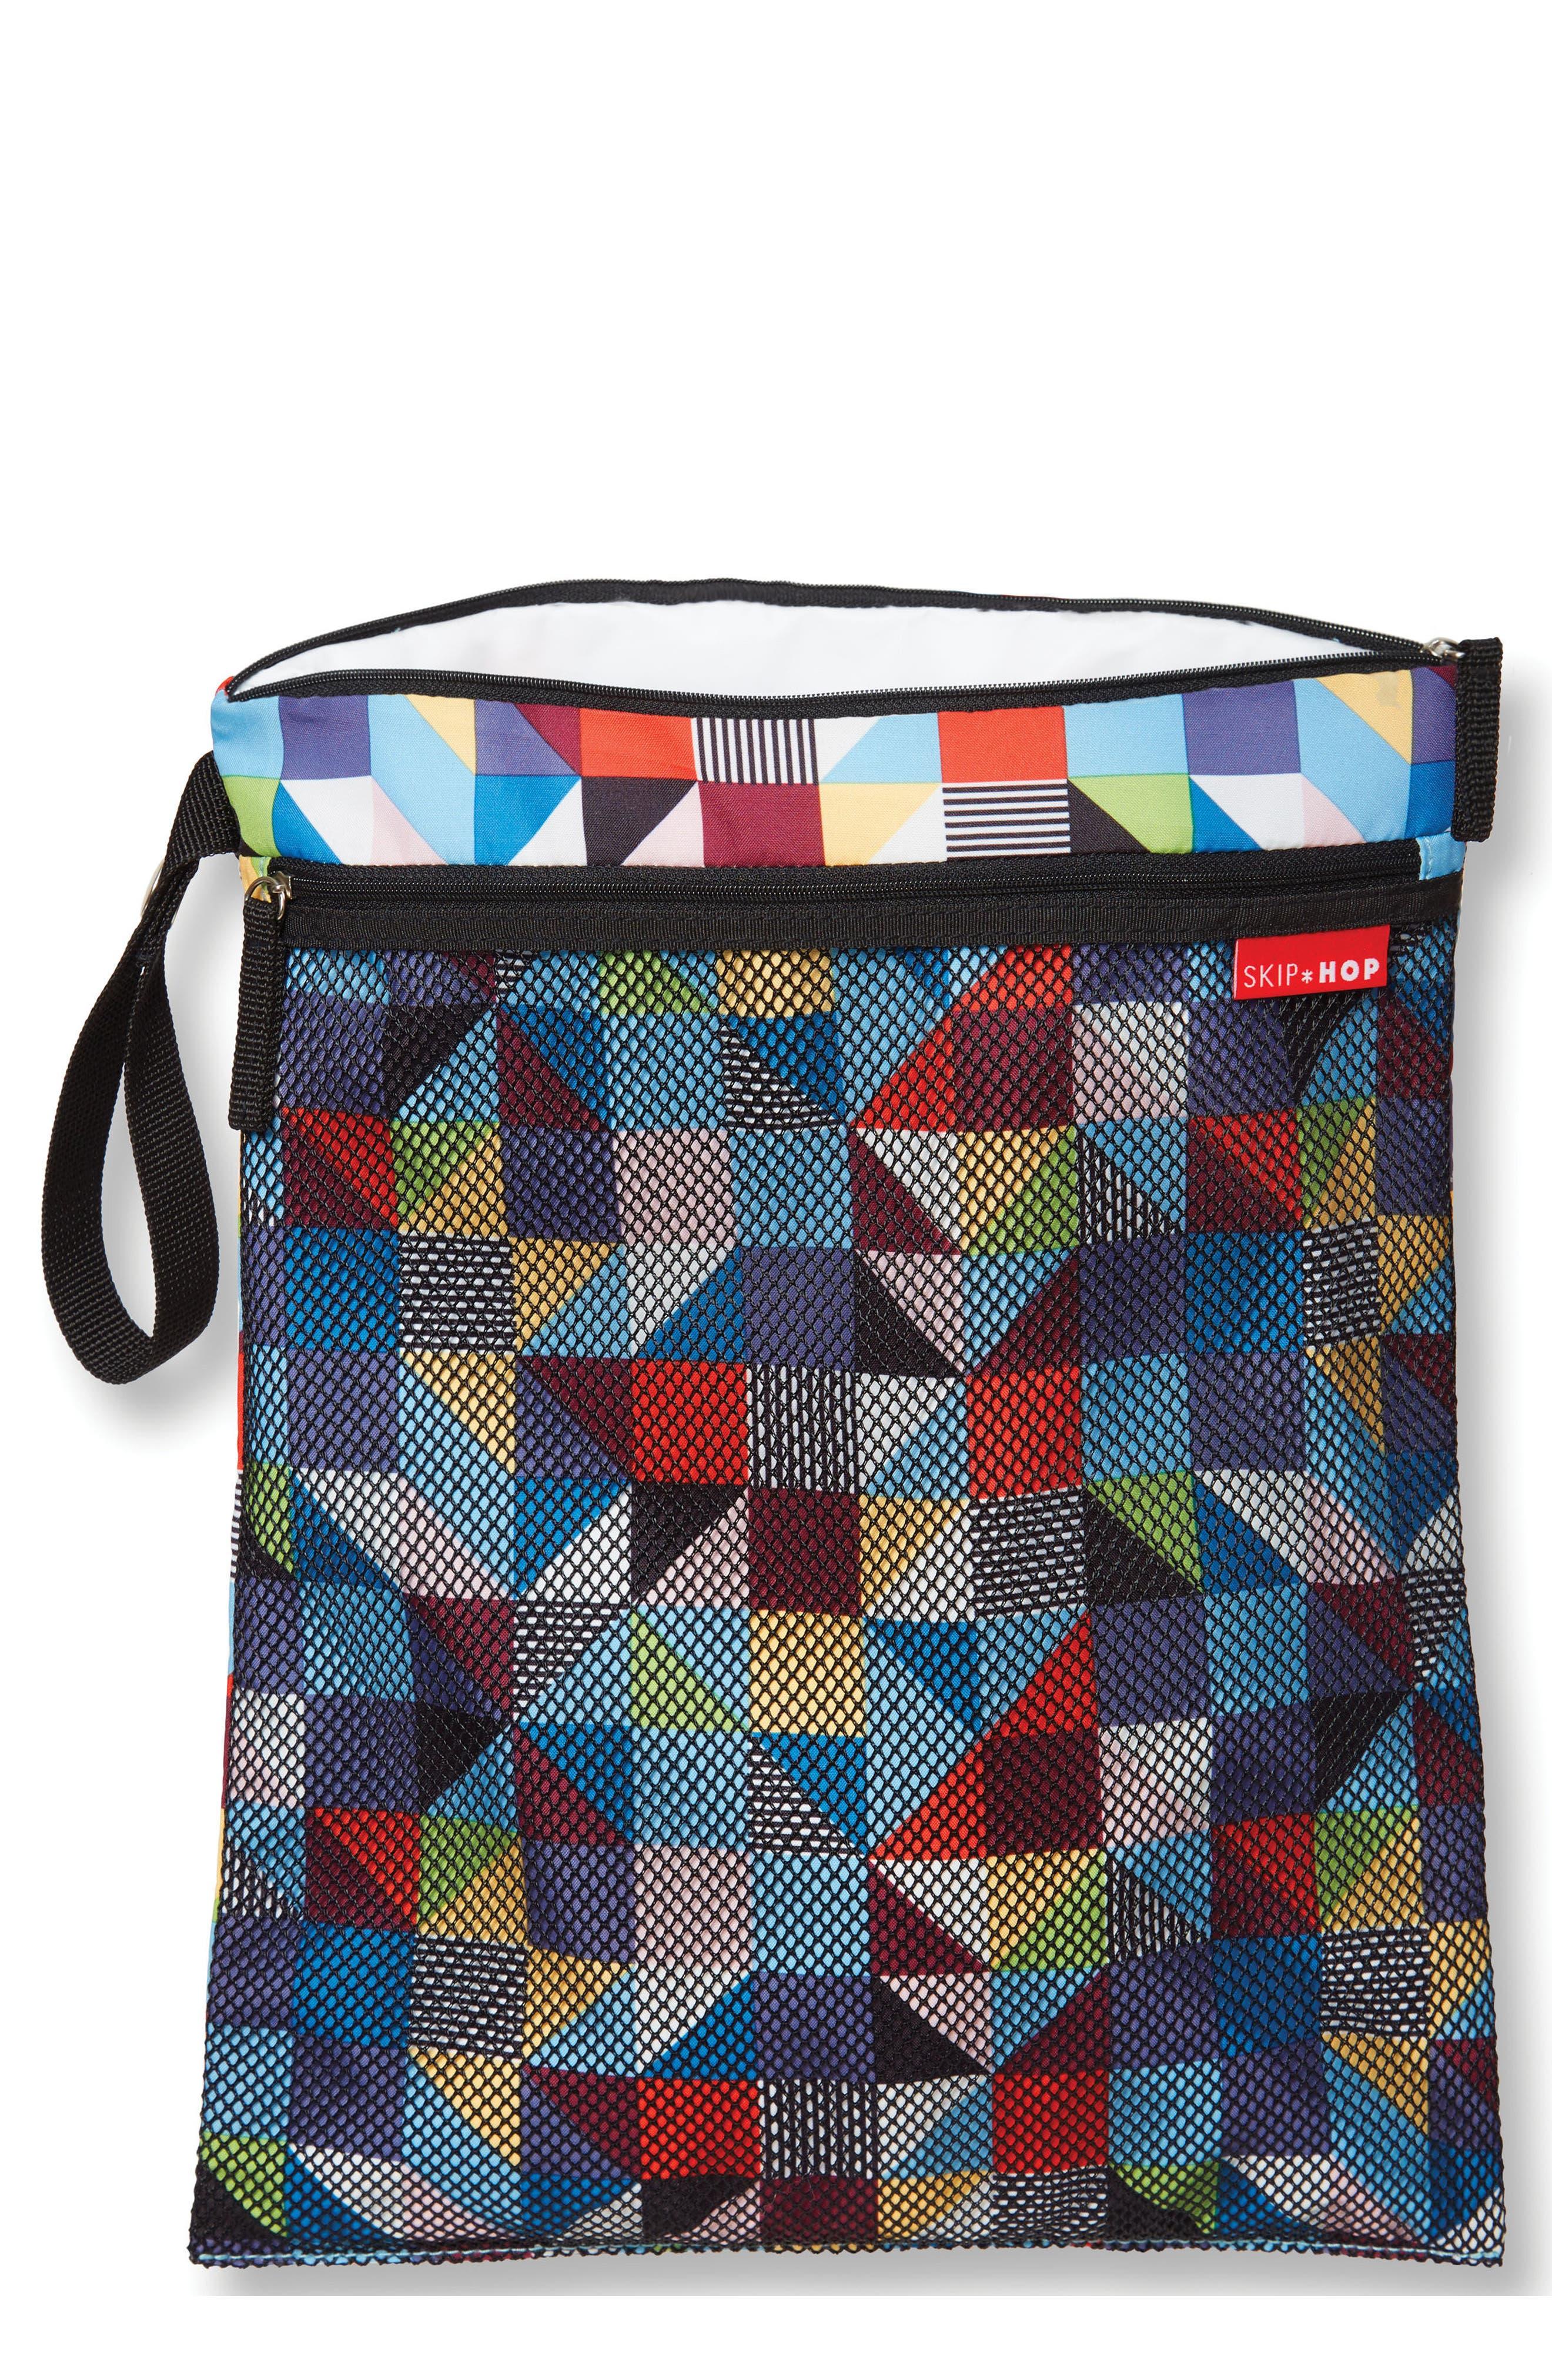 Main Image - Skip Hop 'Grab & Go' Wet/Dry Bag